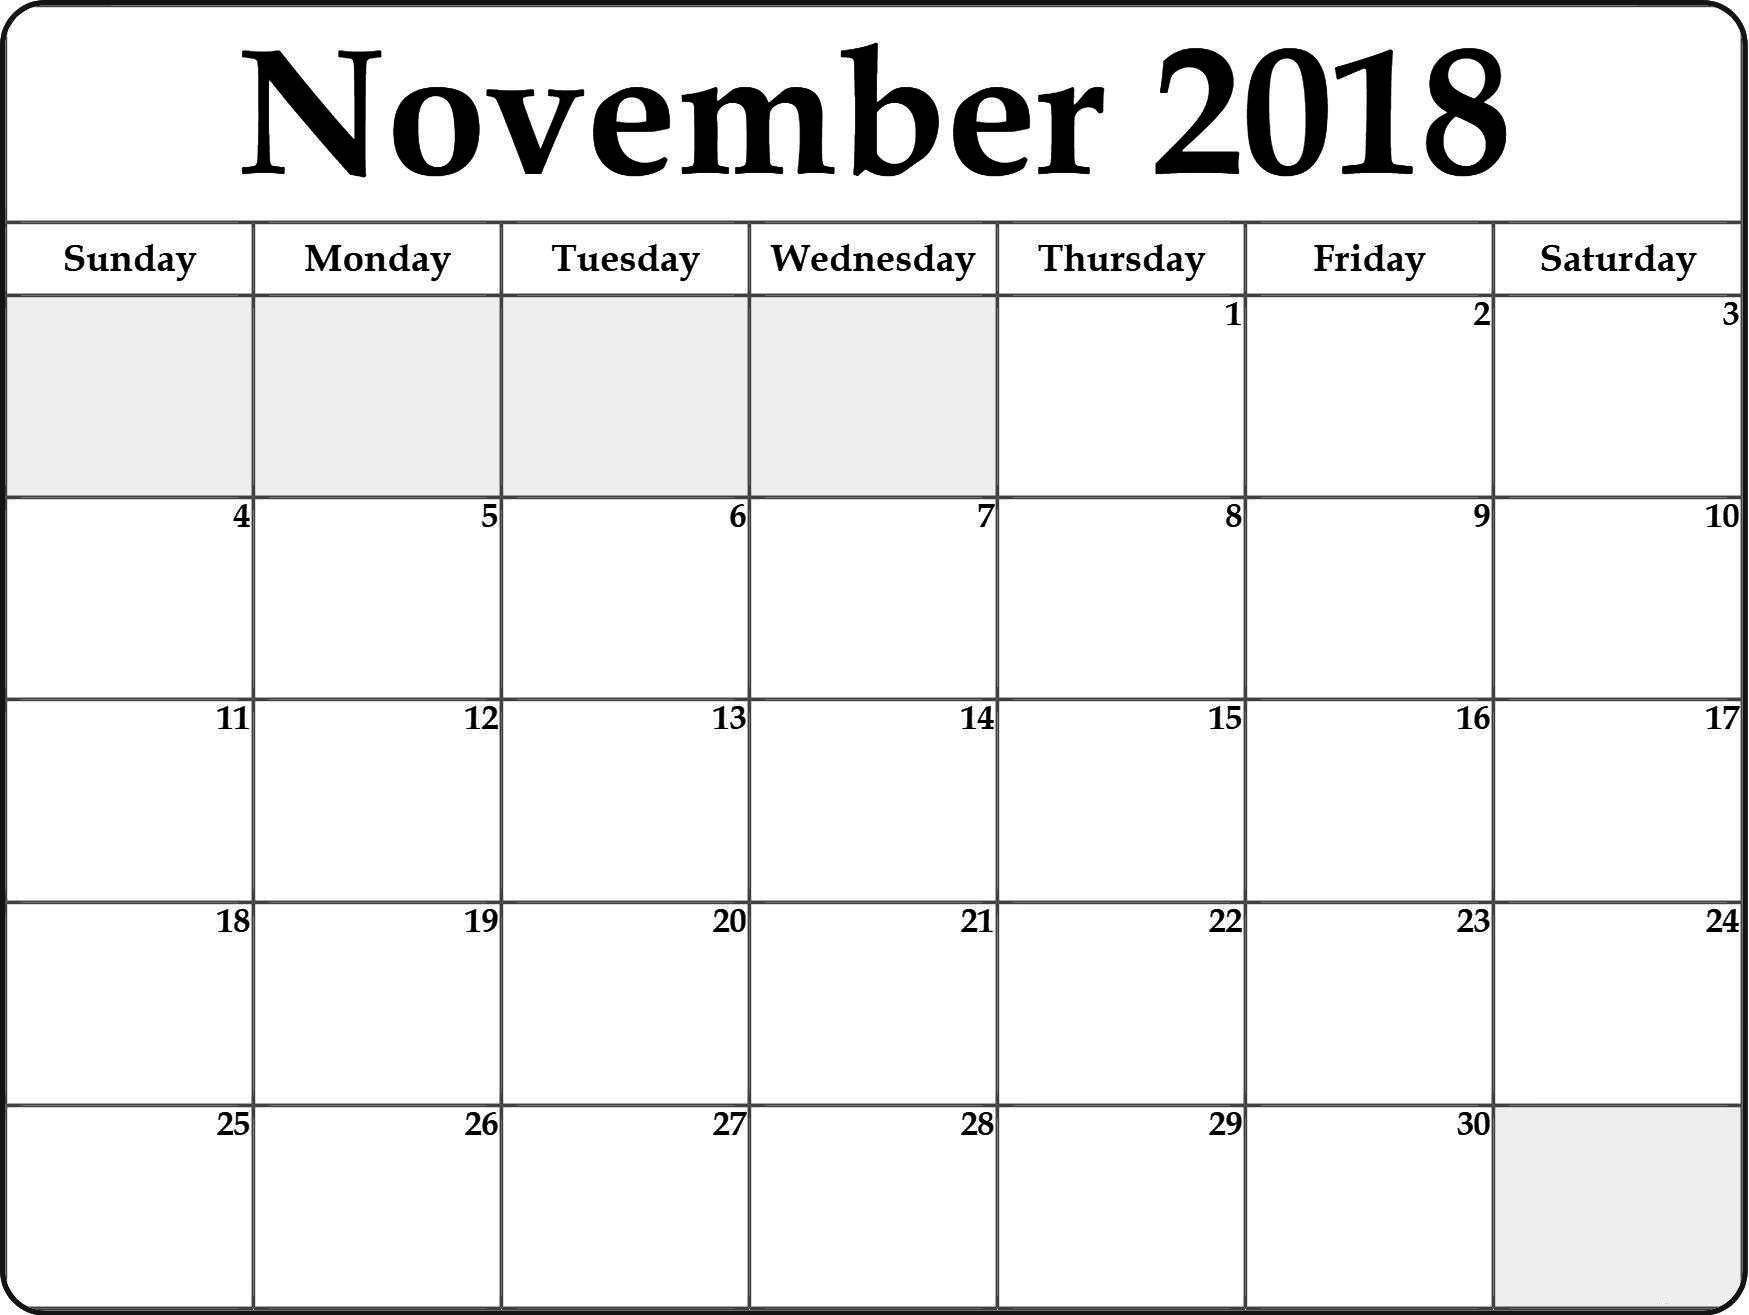 November Calendar 2018 In Pdf, Word, Excel Printable Template within Blank Calendar For November And December